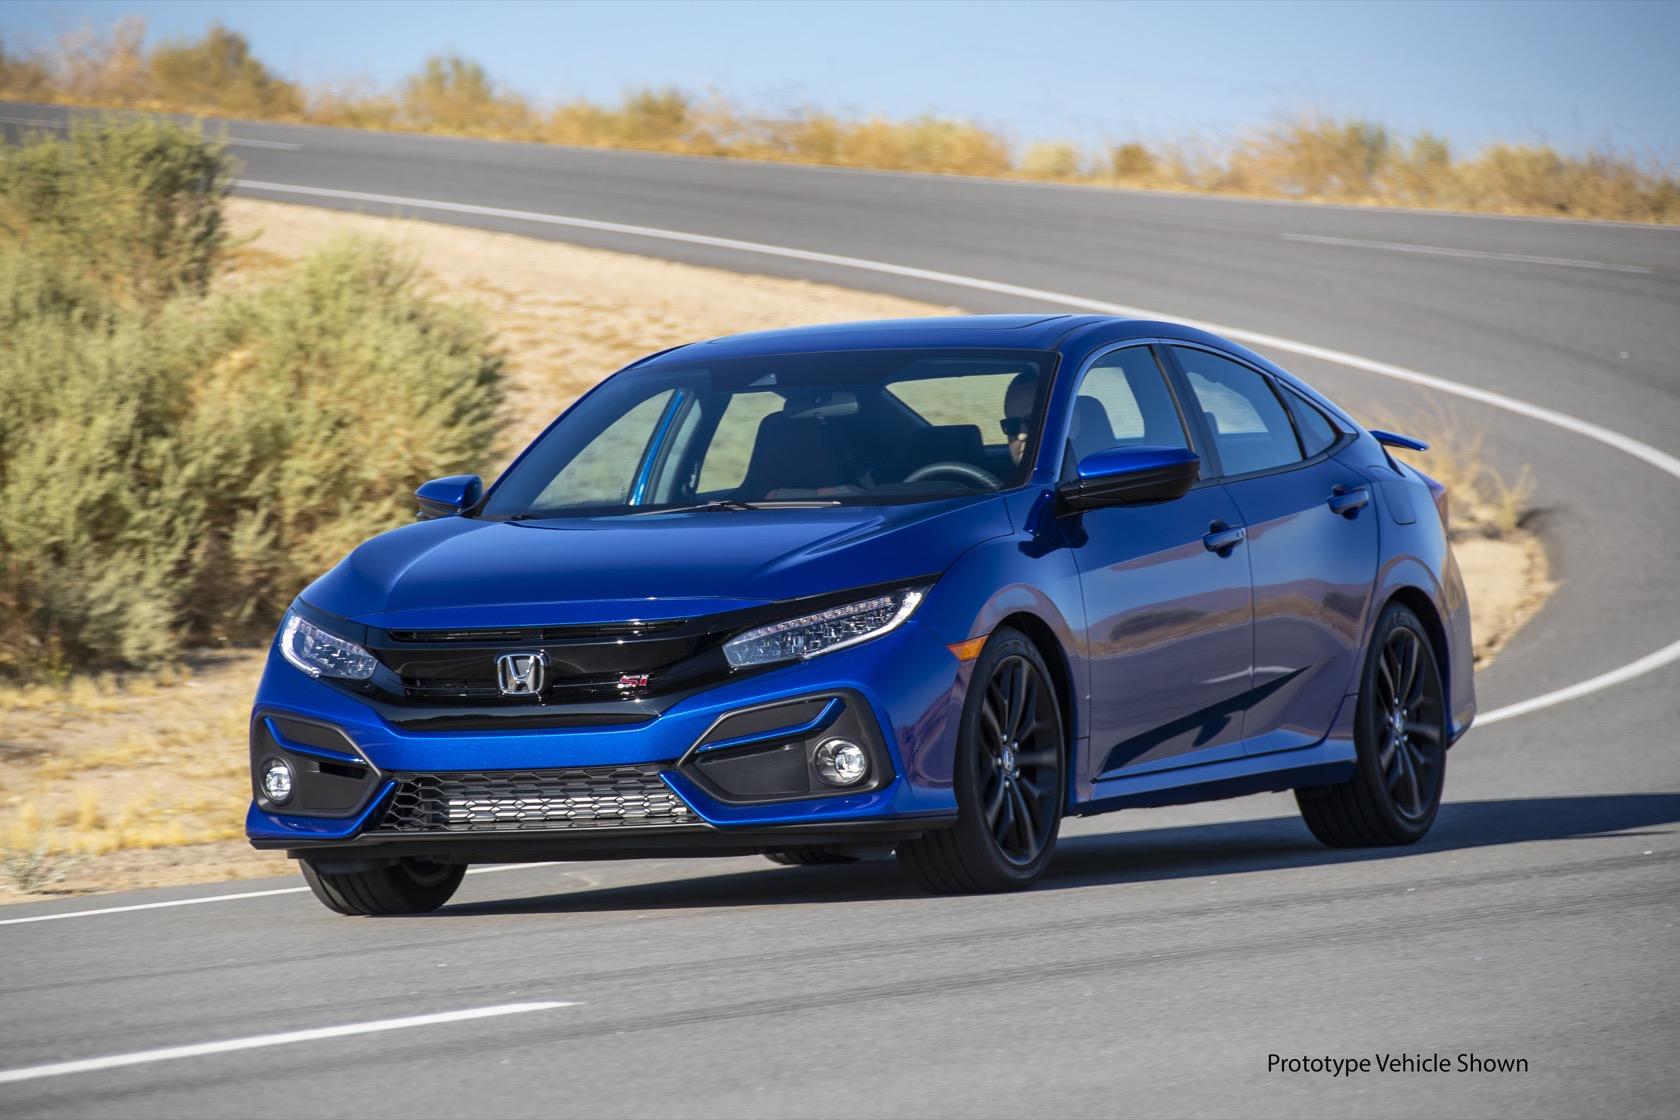 2020 Honda Civic Si Gallery - SlashGear